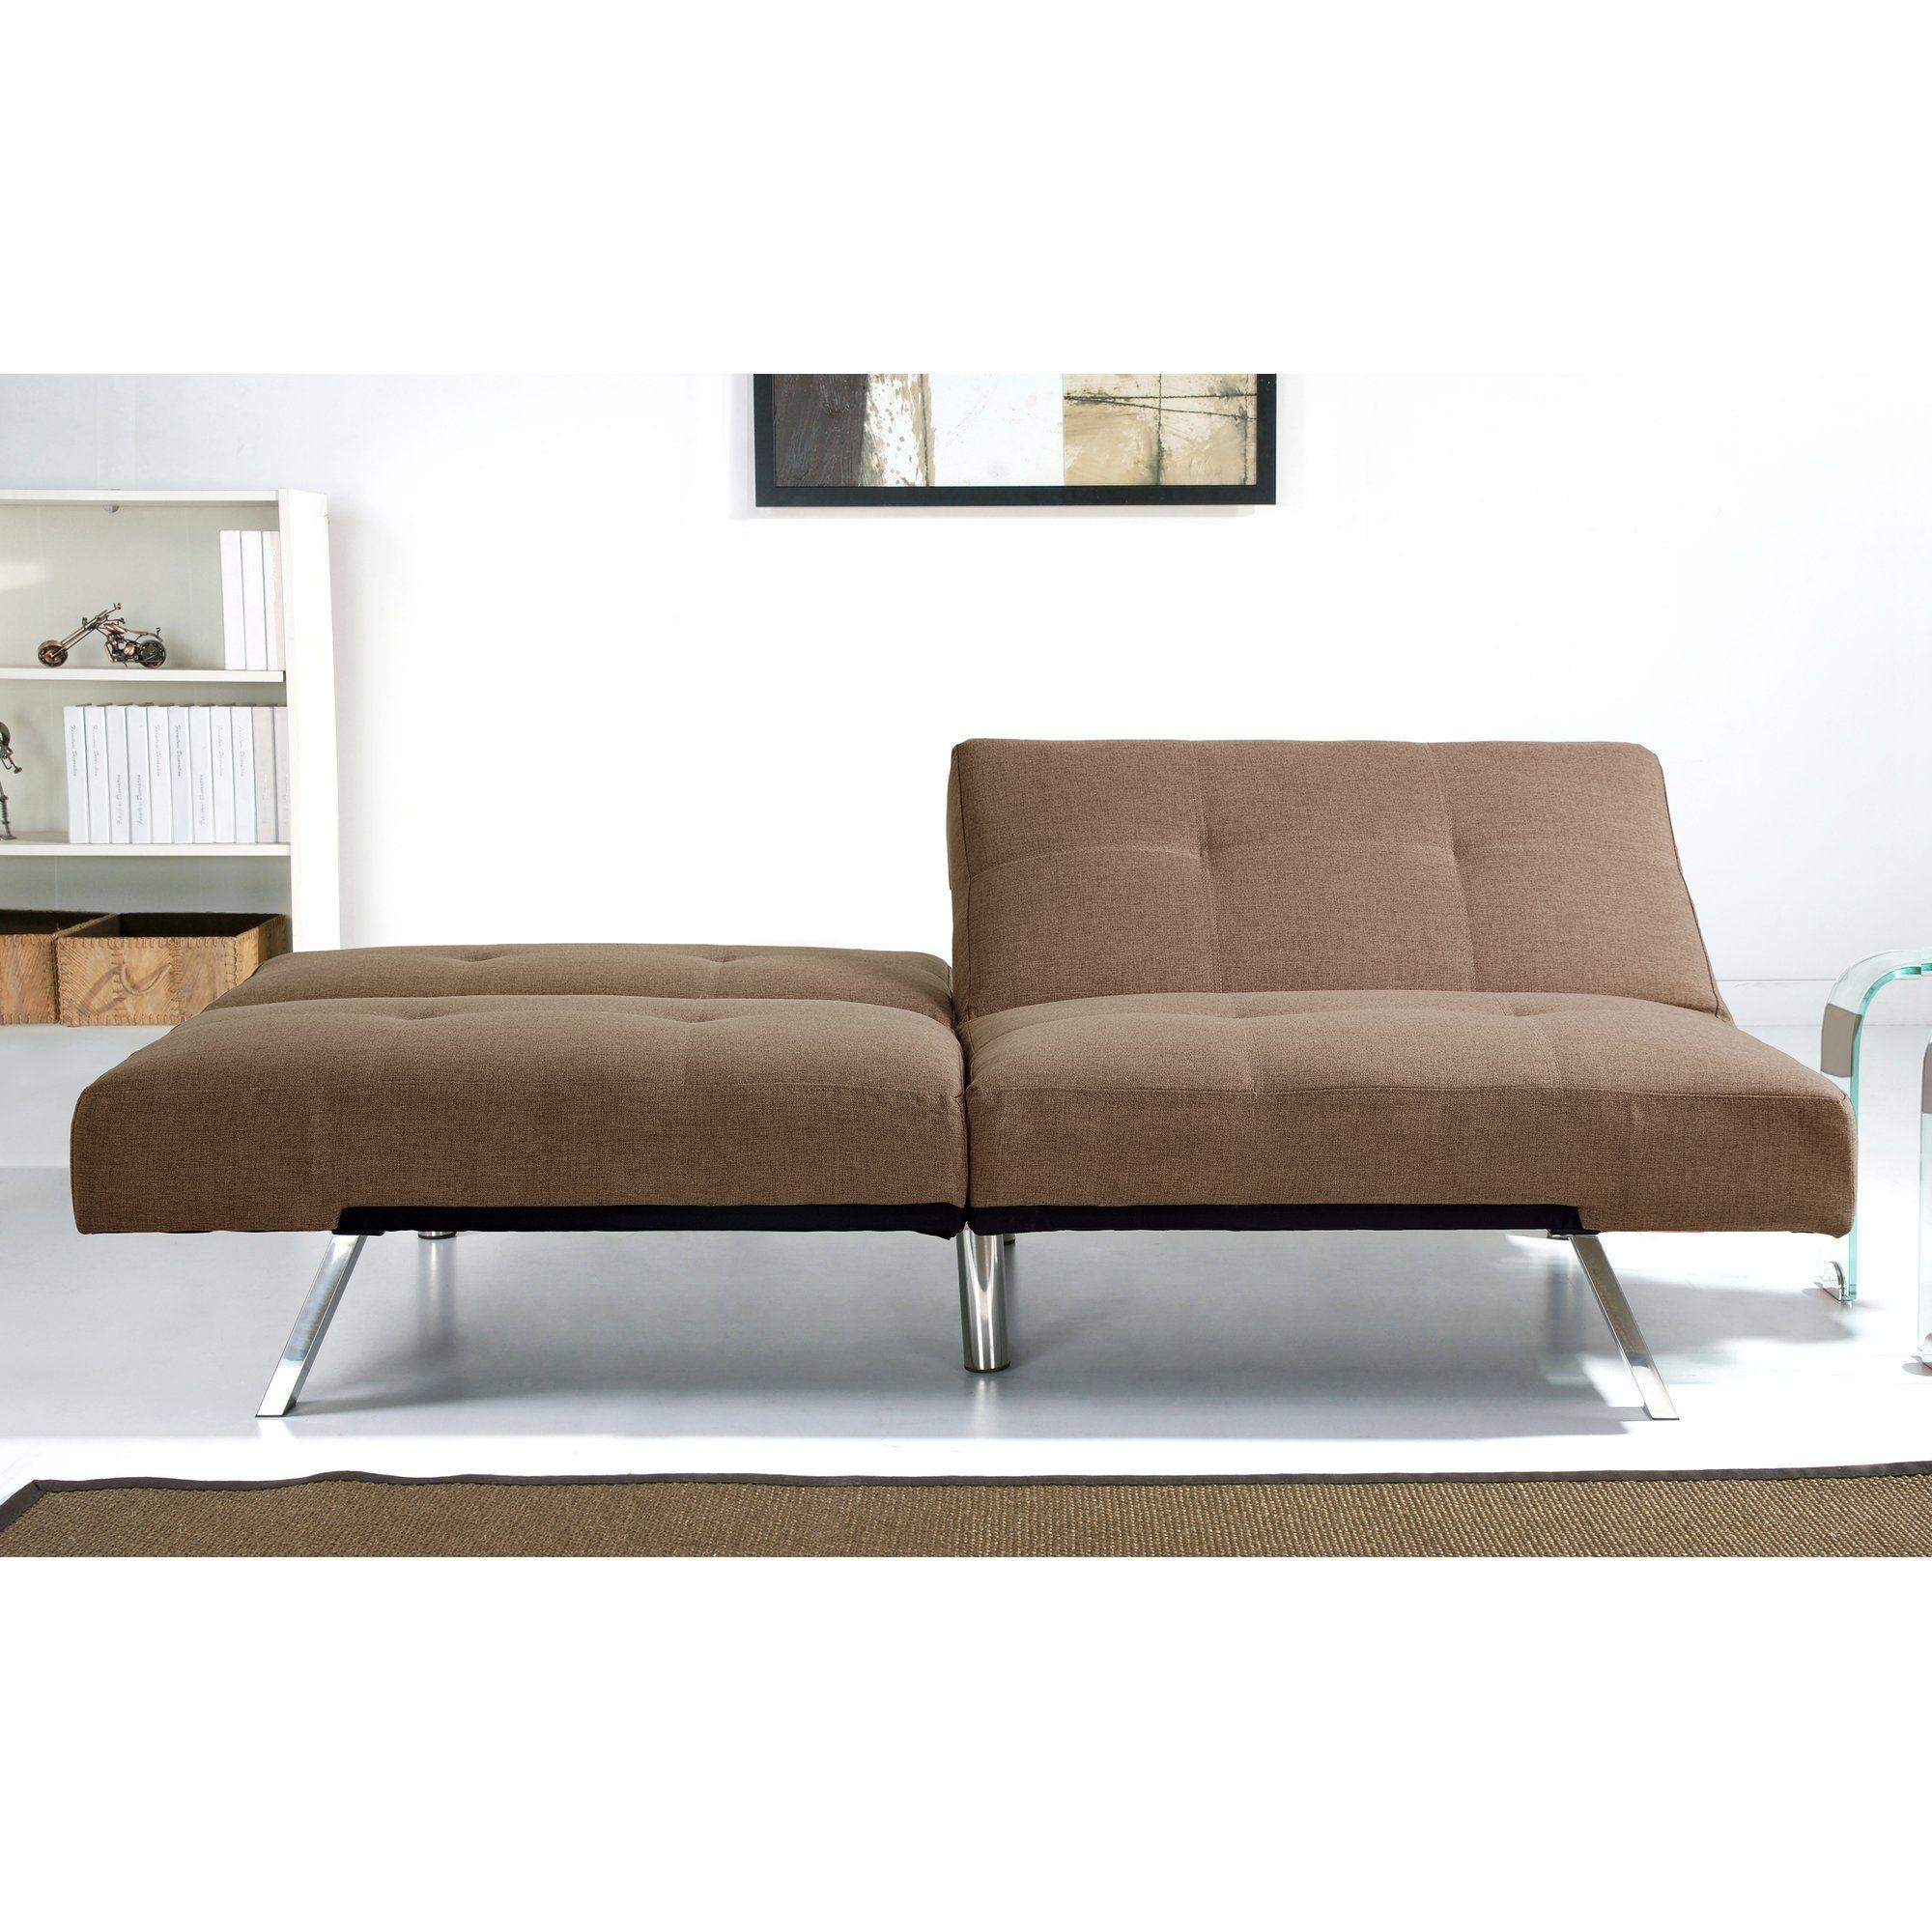 sleeper sofa sleeper sofas and decorating